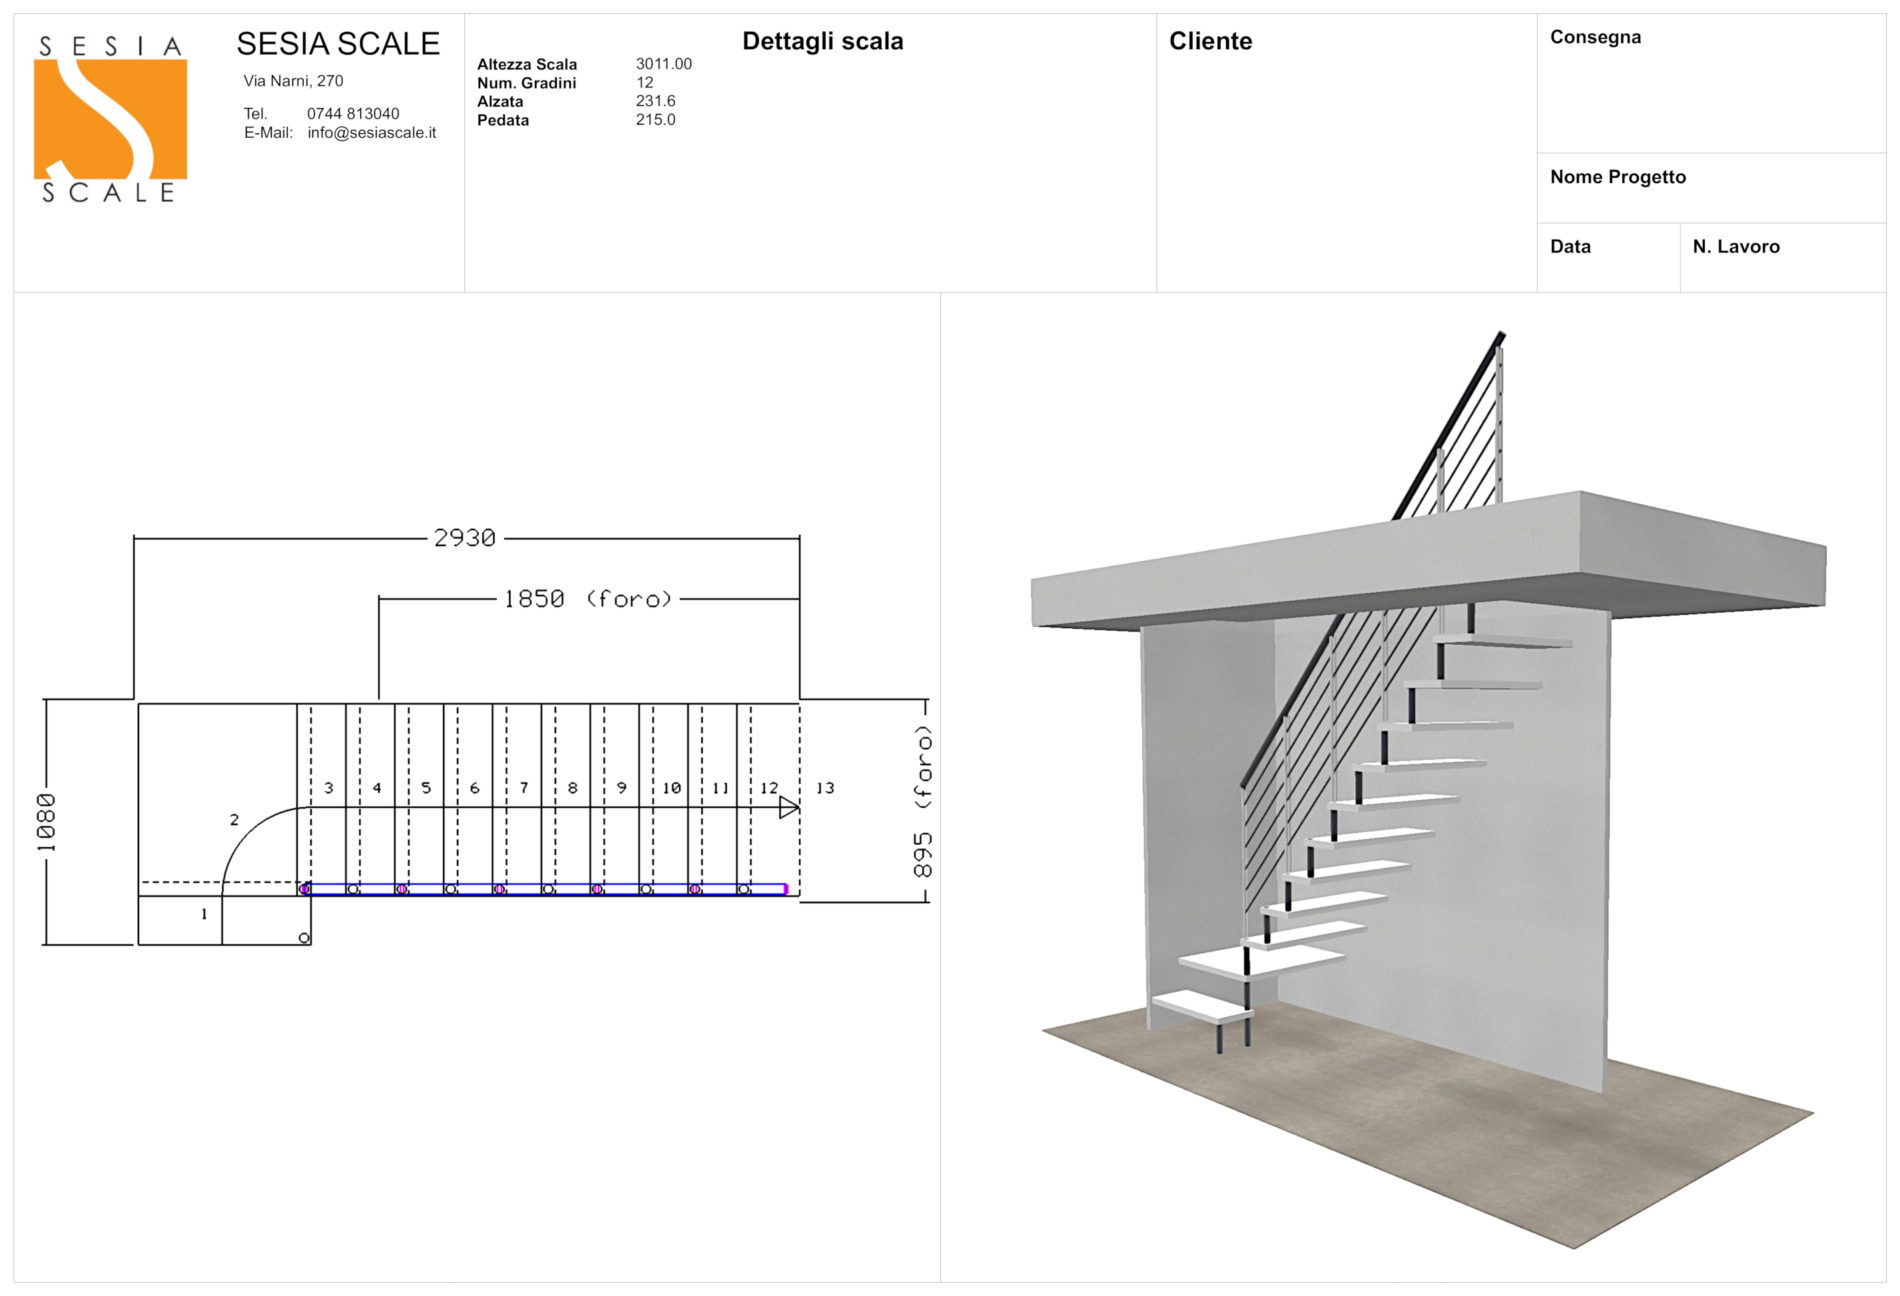 Altezza Gradini Scala customized indoor stairs: sesia scale, terni, rome and